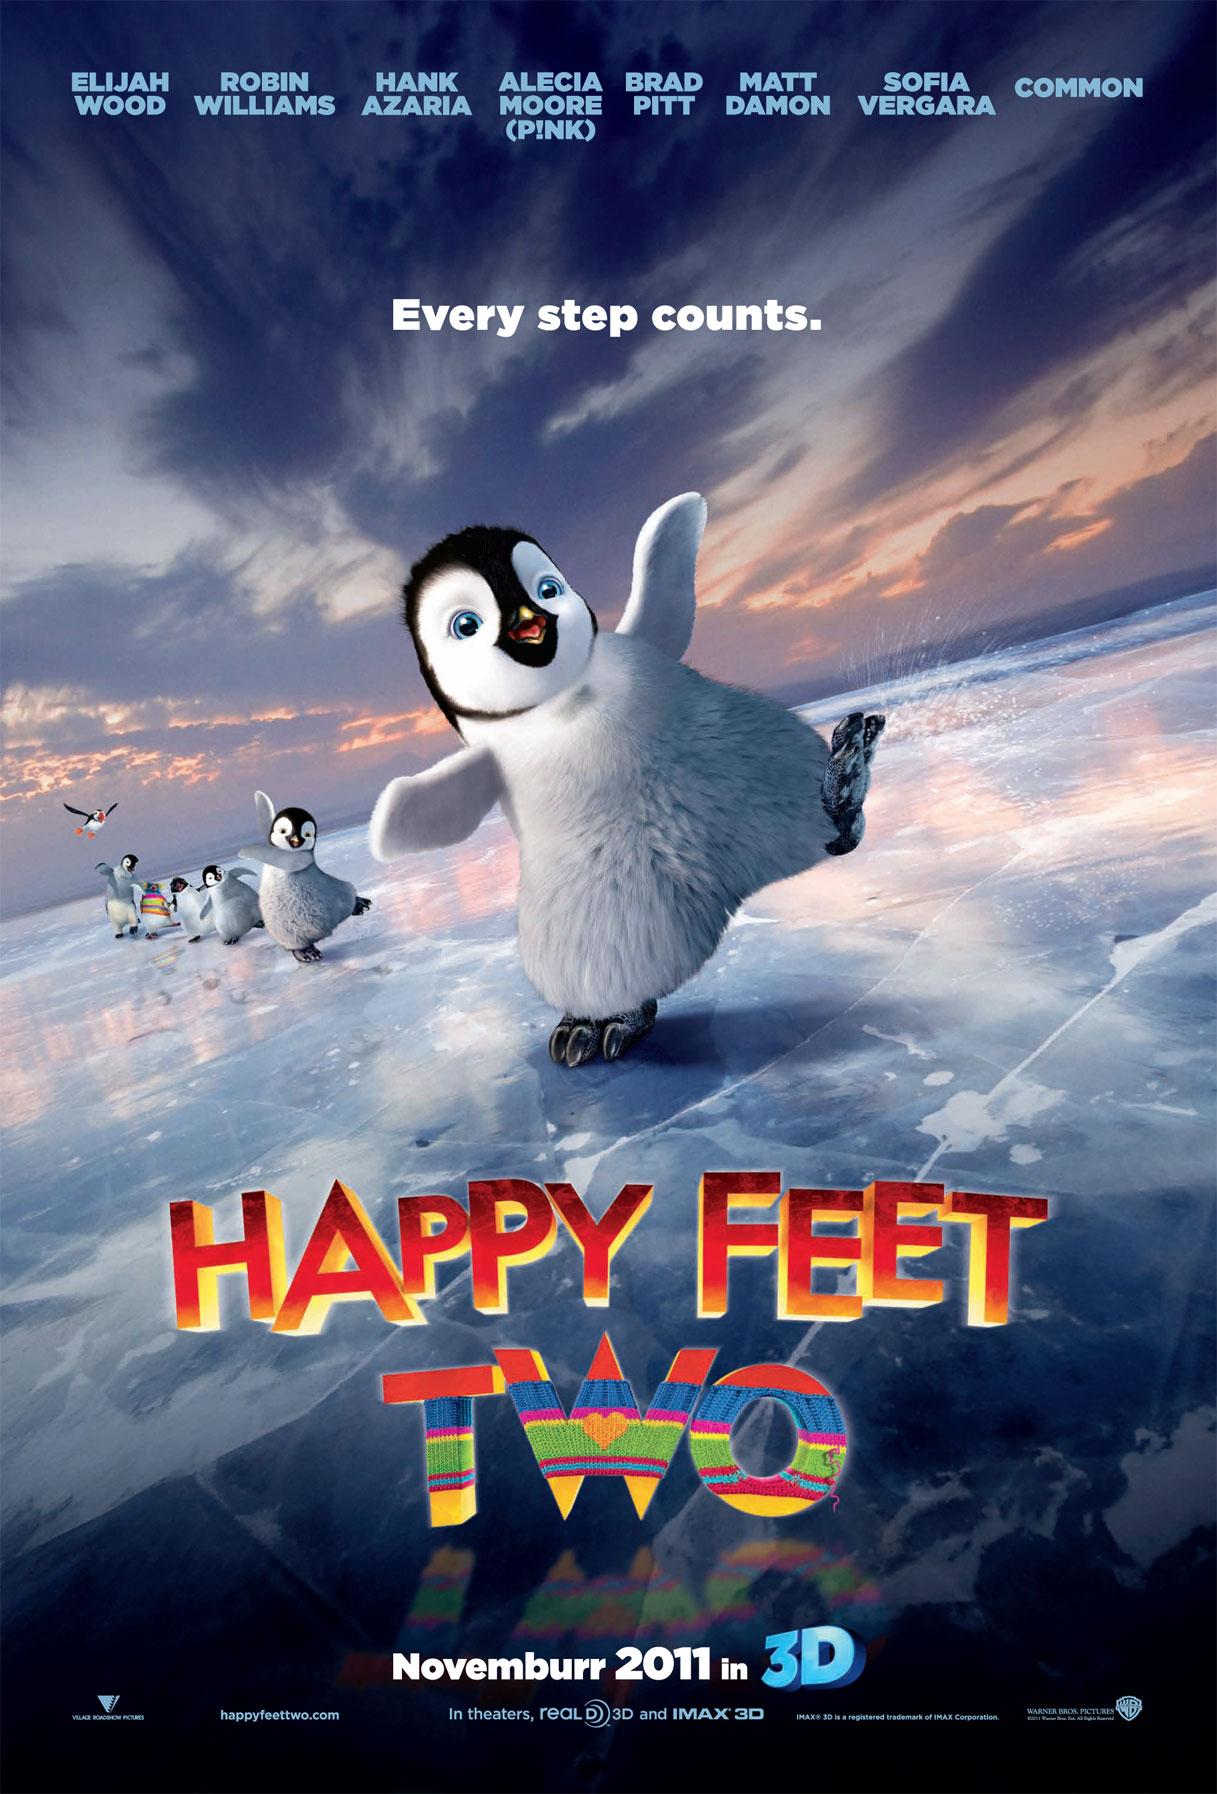 Happy-Feet-Two-Wallpaper-Movie-Poster-2.jpg